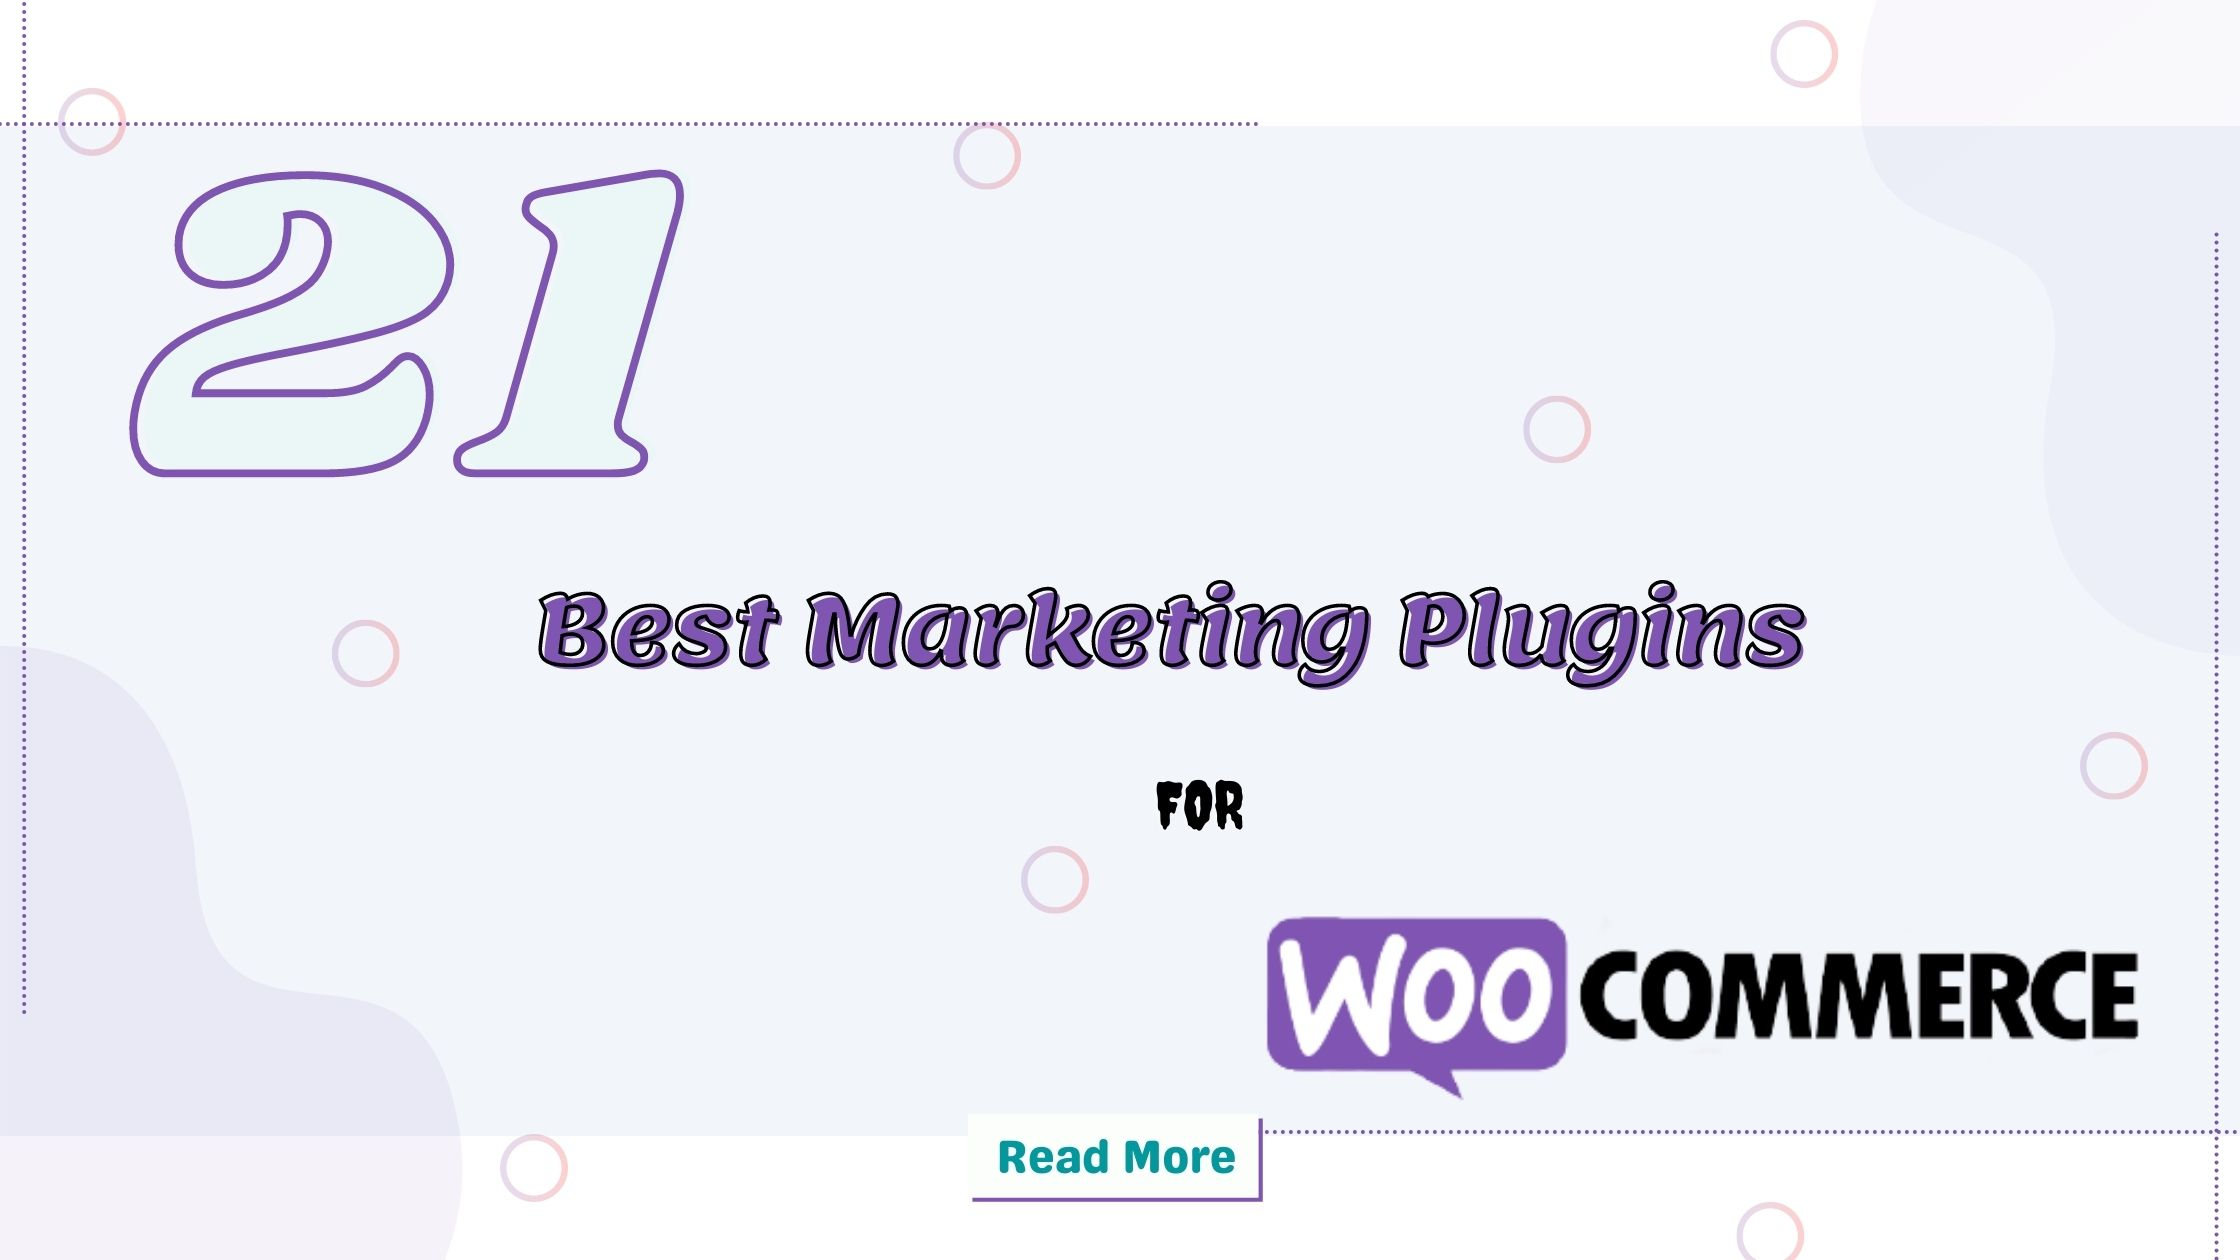 21 Best Marketing Plugins For WooCommerce